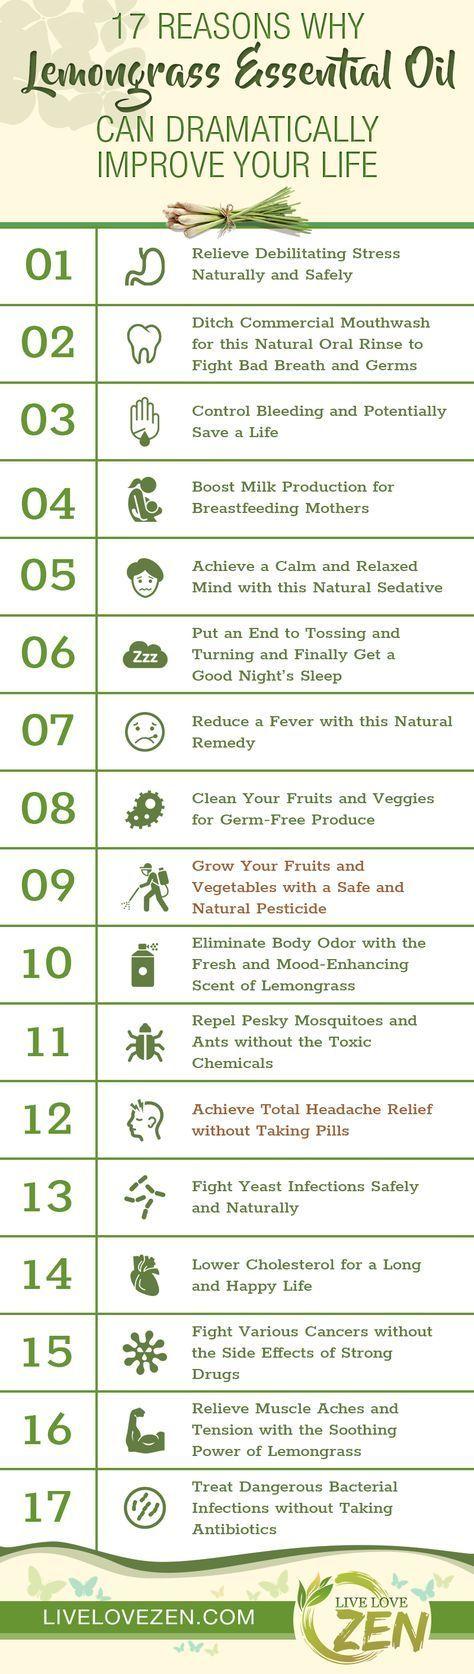 Lemongrass Essential Oil Benefits Infographic #HolisticRemedies